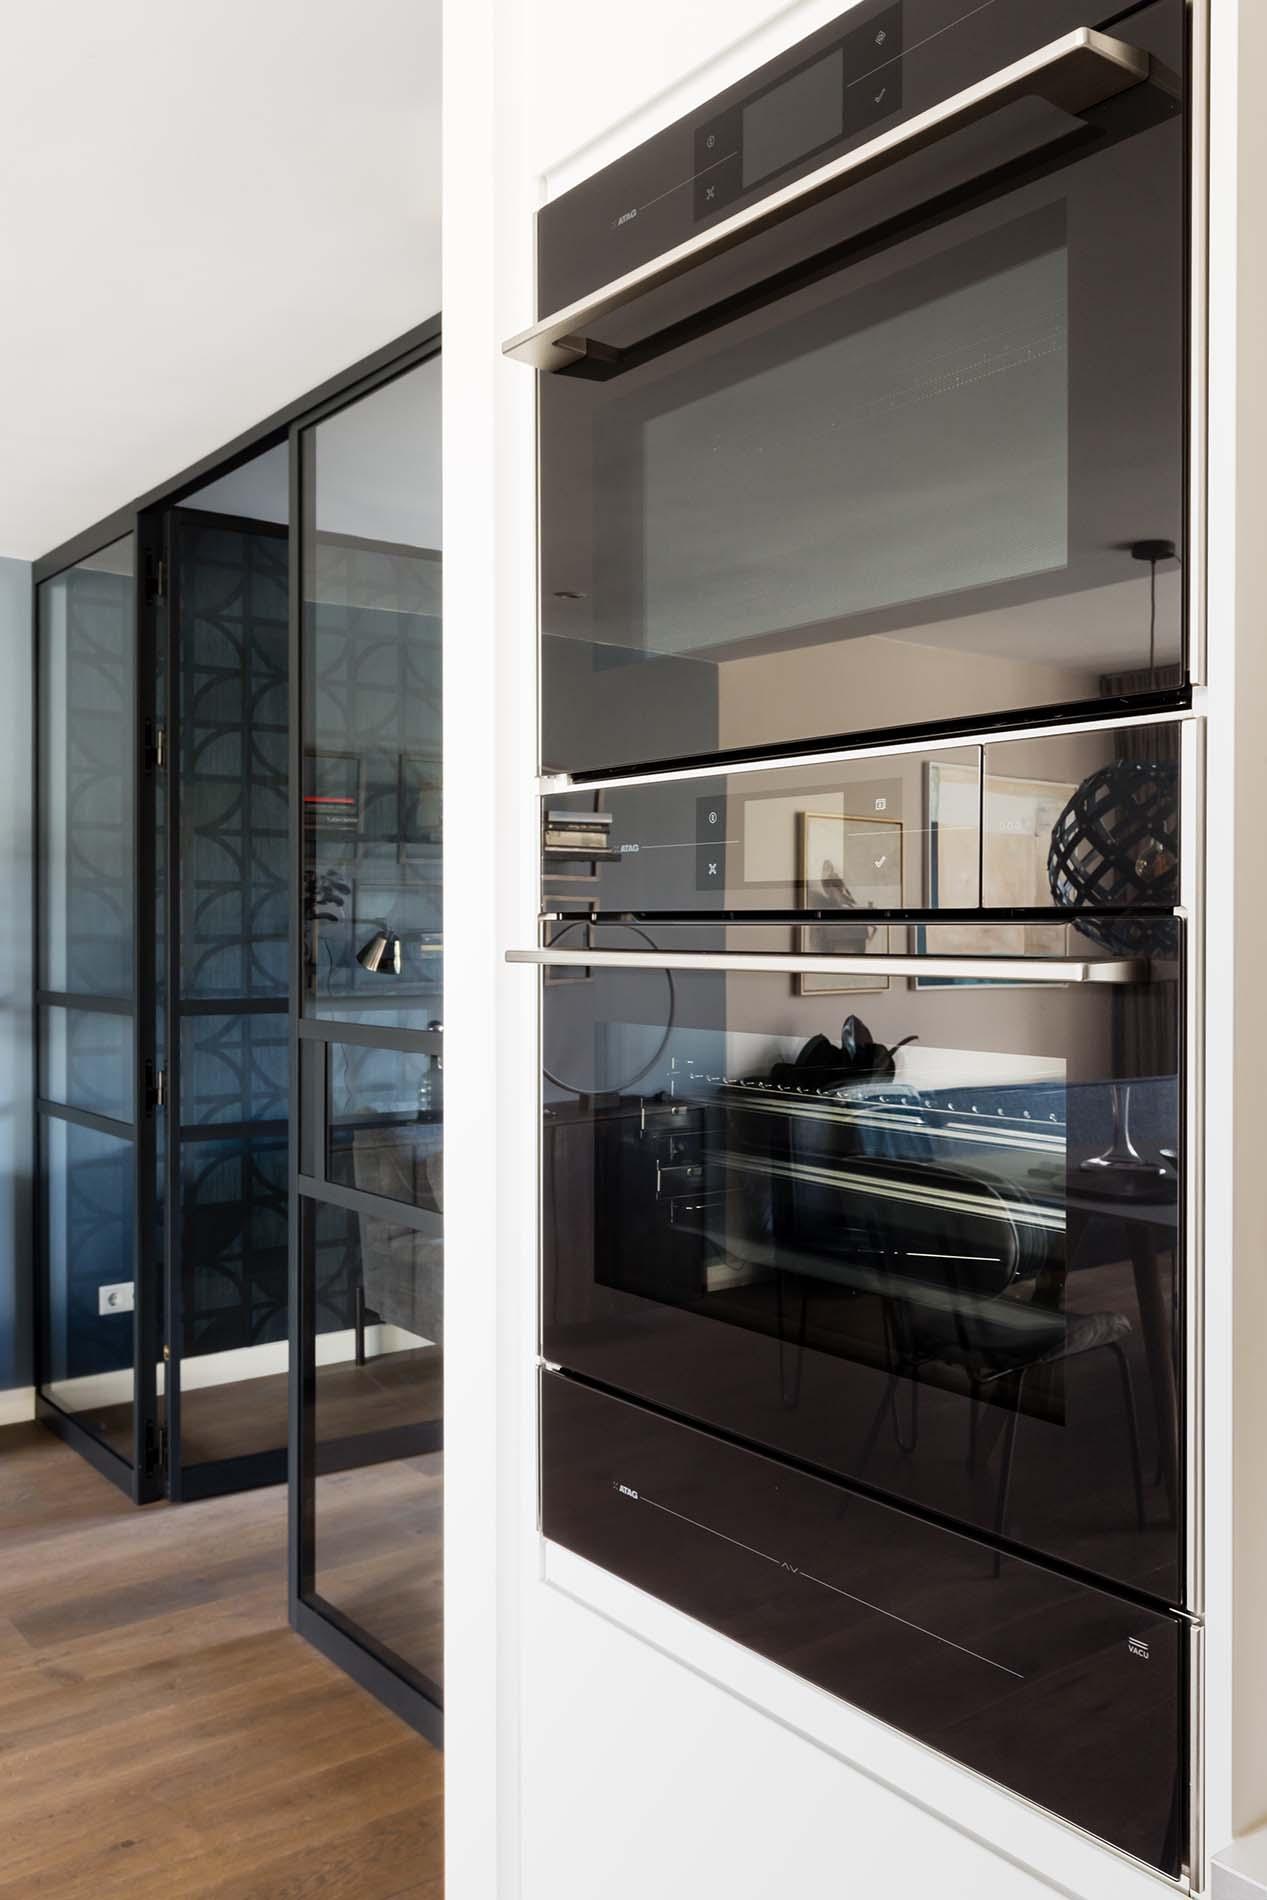 vtwonen keuken met zwarte ATAG apparatuur, Keukenapparatuur ASWA Keukens